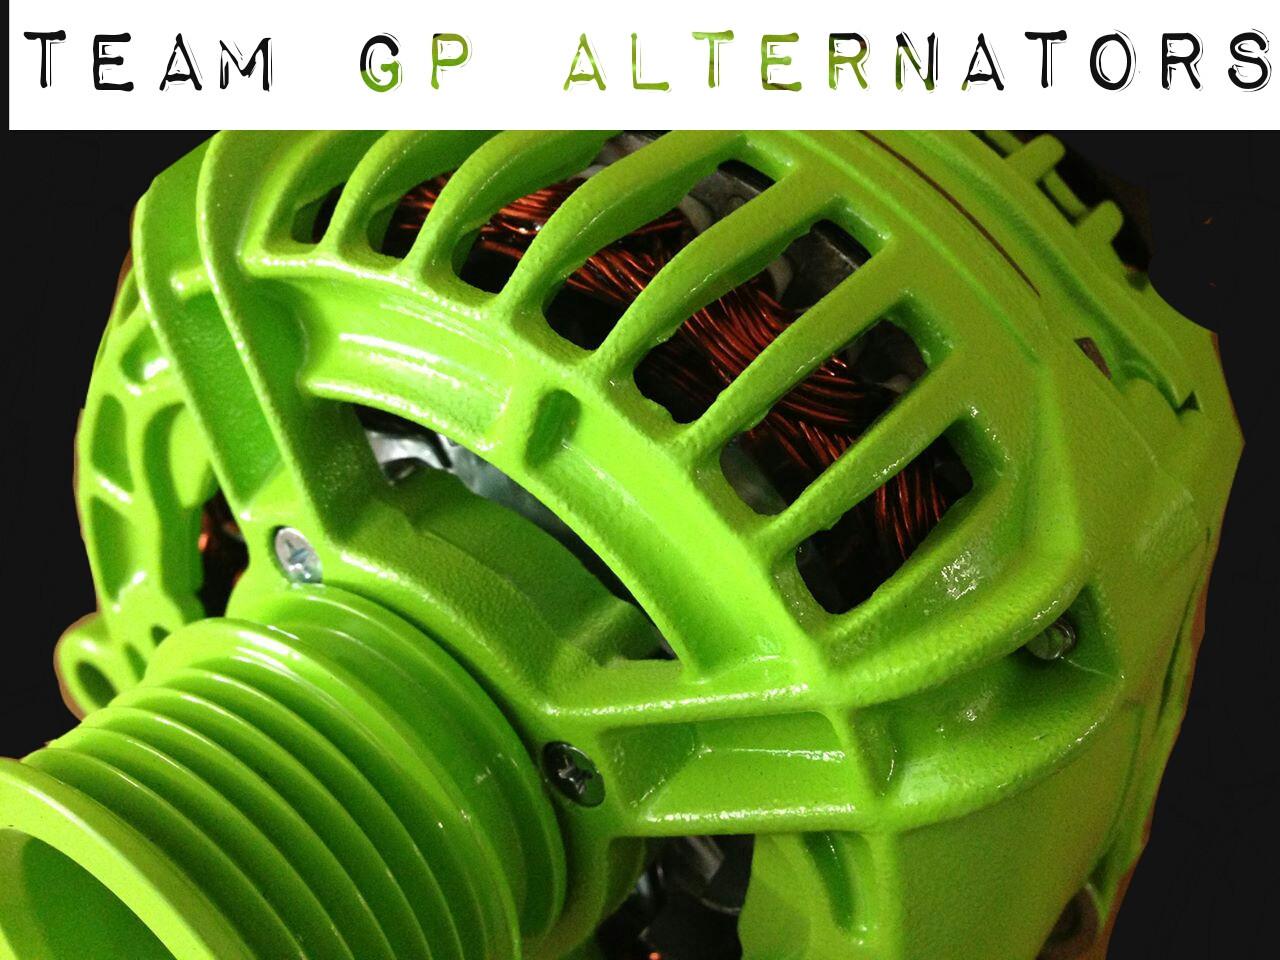 SUBARU FORESTER 2.5L -1998- 160AMP TEAM GP Alternator